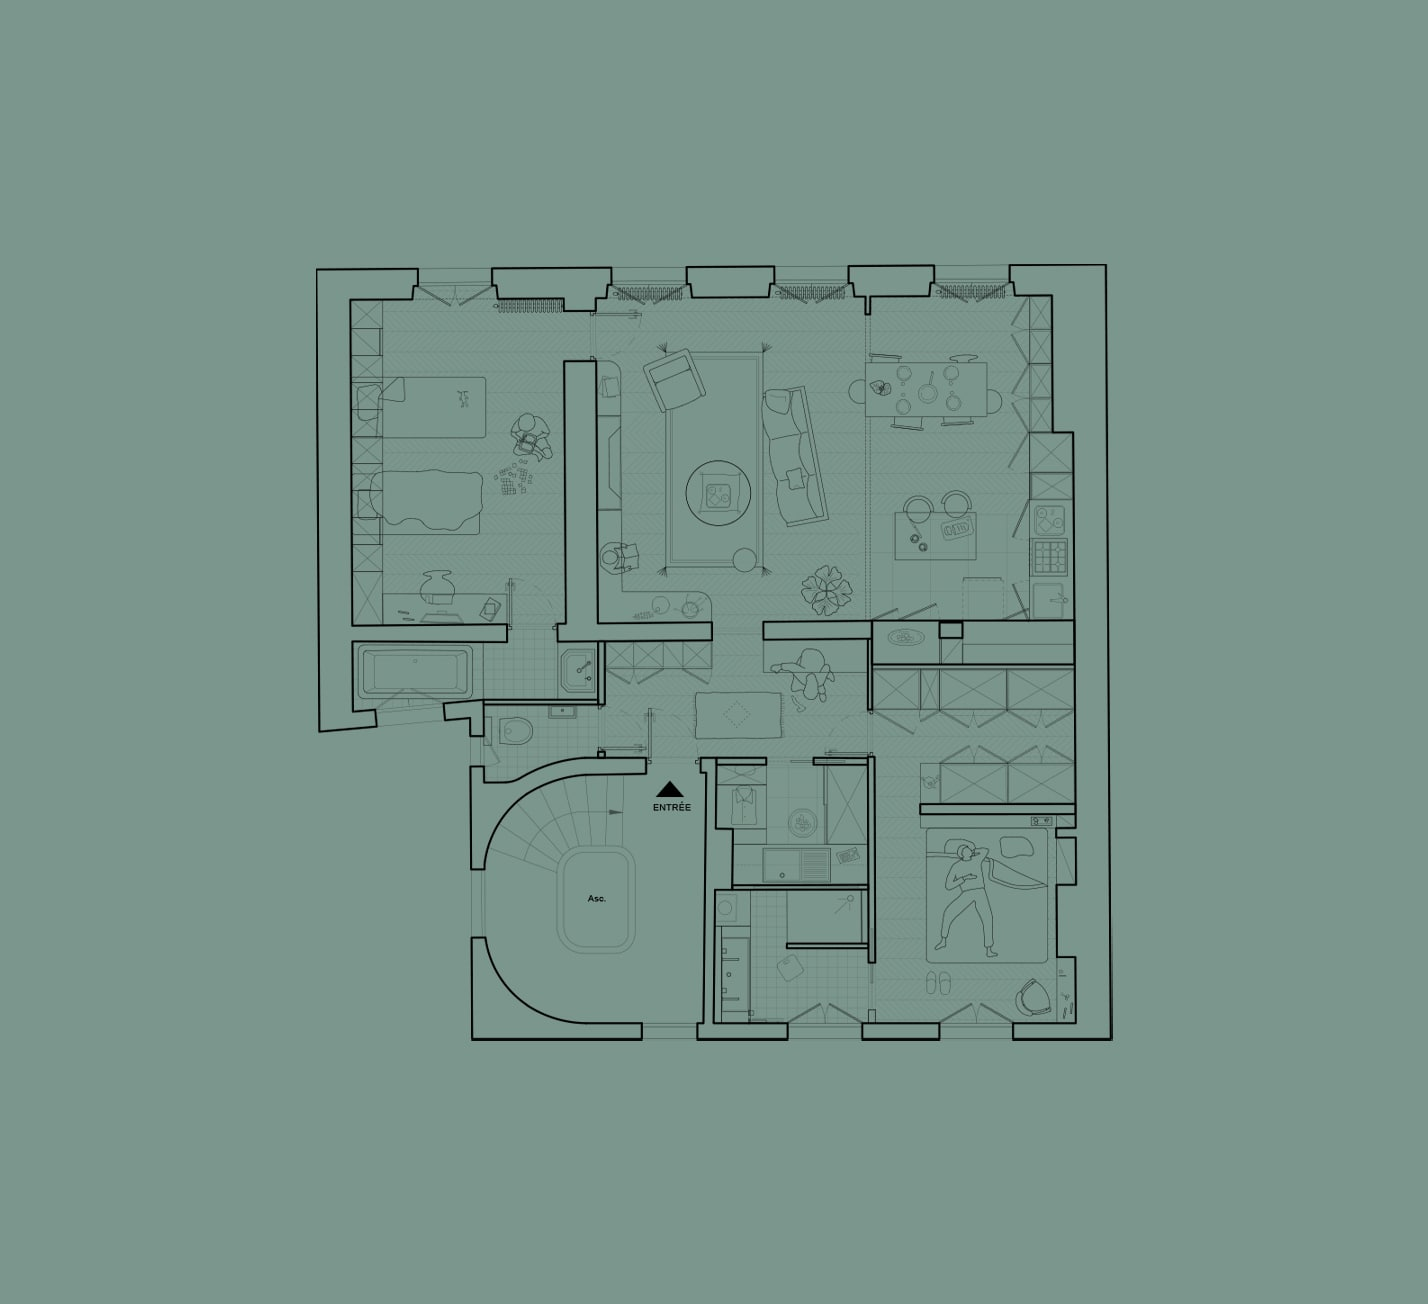 Appartement-Jules-Cesar-Plan-dessin-01-min-1